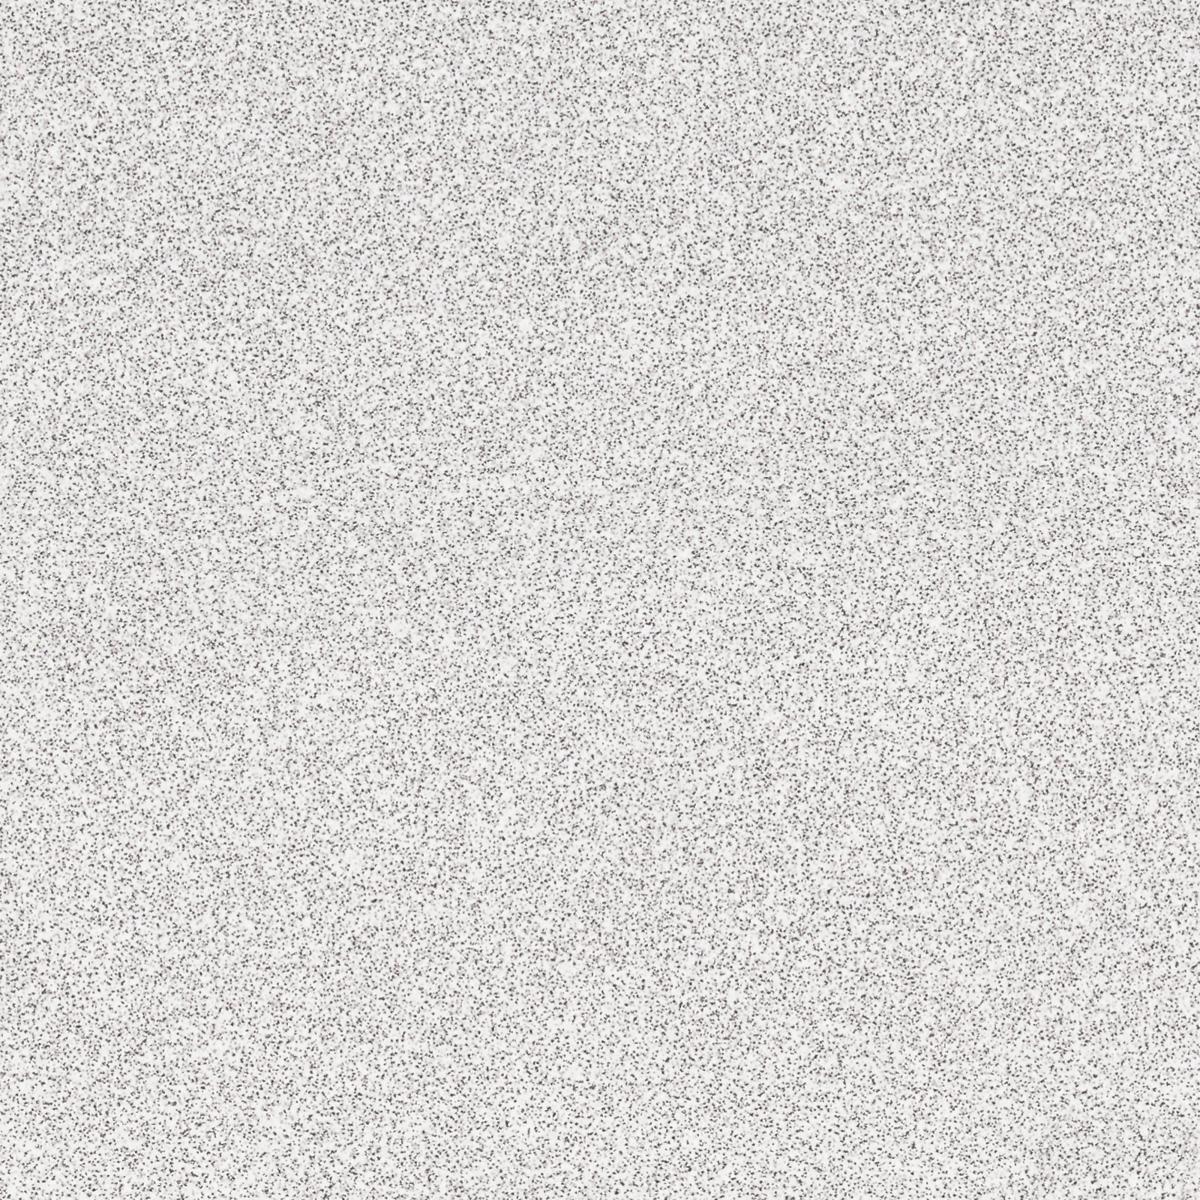 507 Folkstone Grafix - Formica